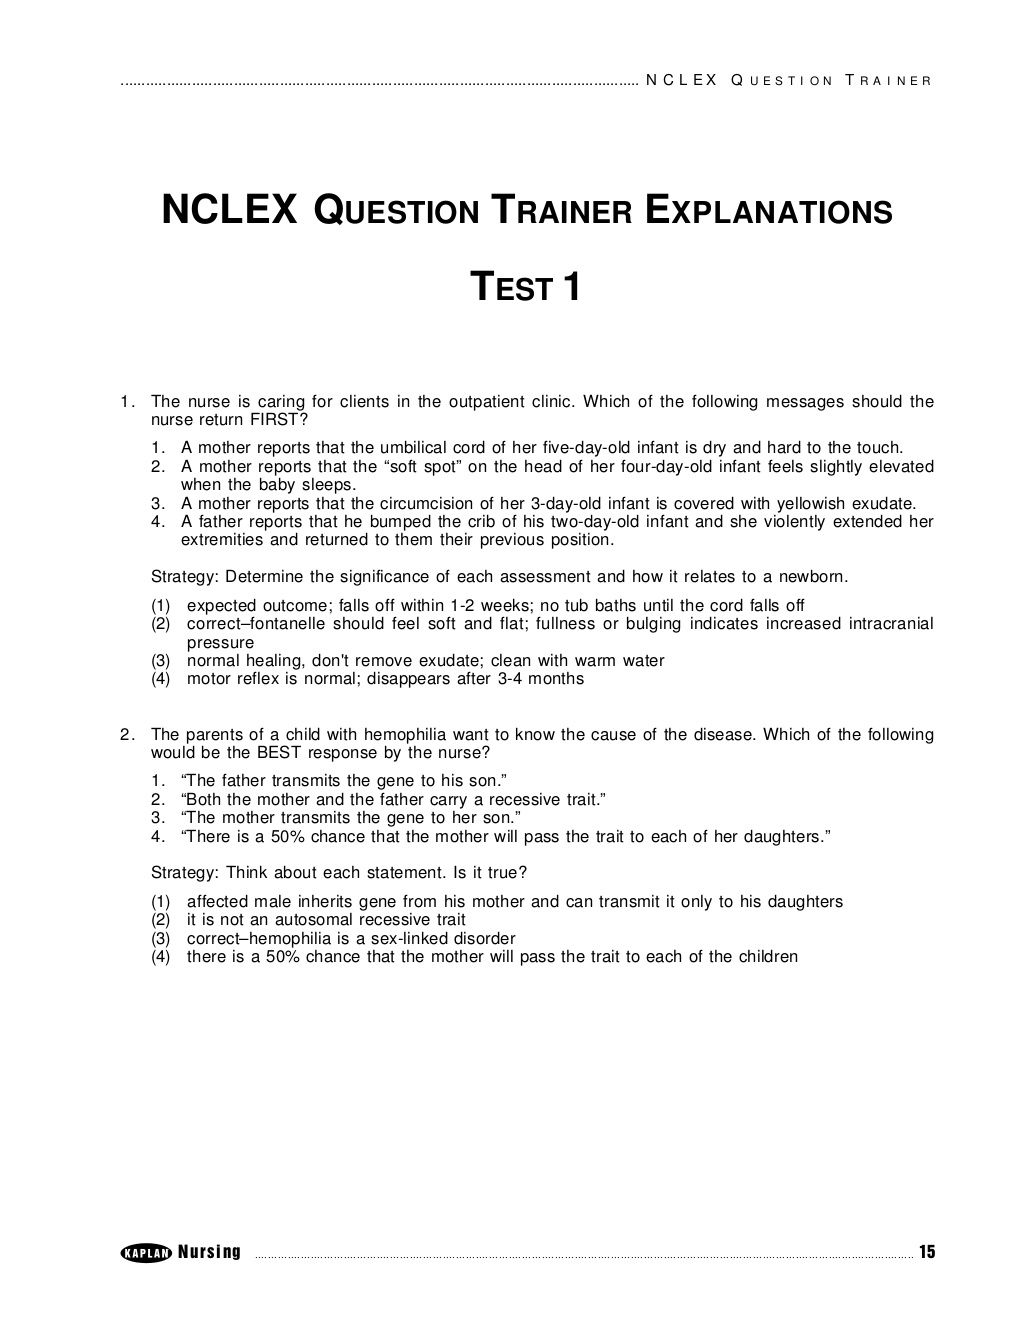 Nclex Question Trainer Explanations Test 1 By Nurse Reviewdotorg Via Slideshare